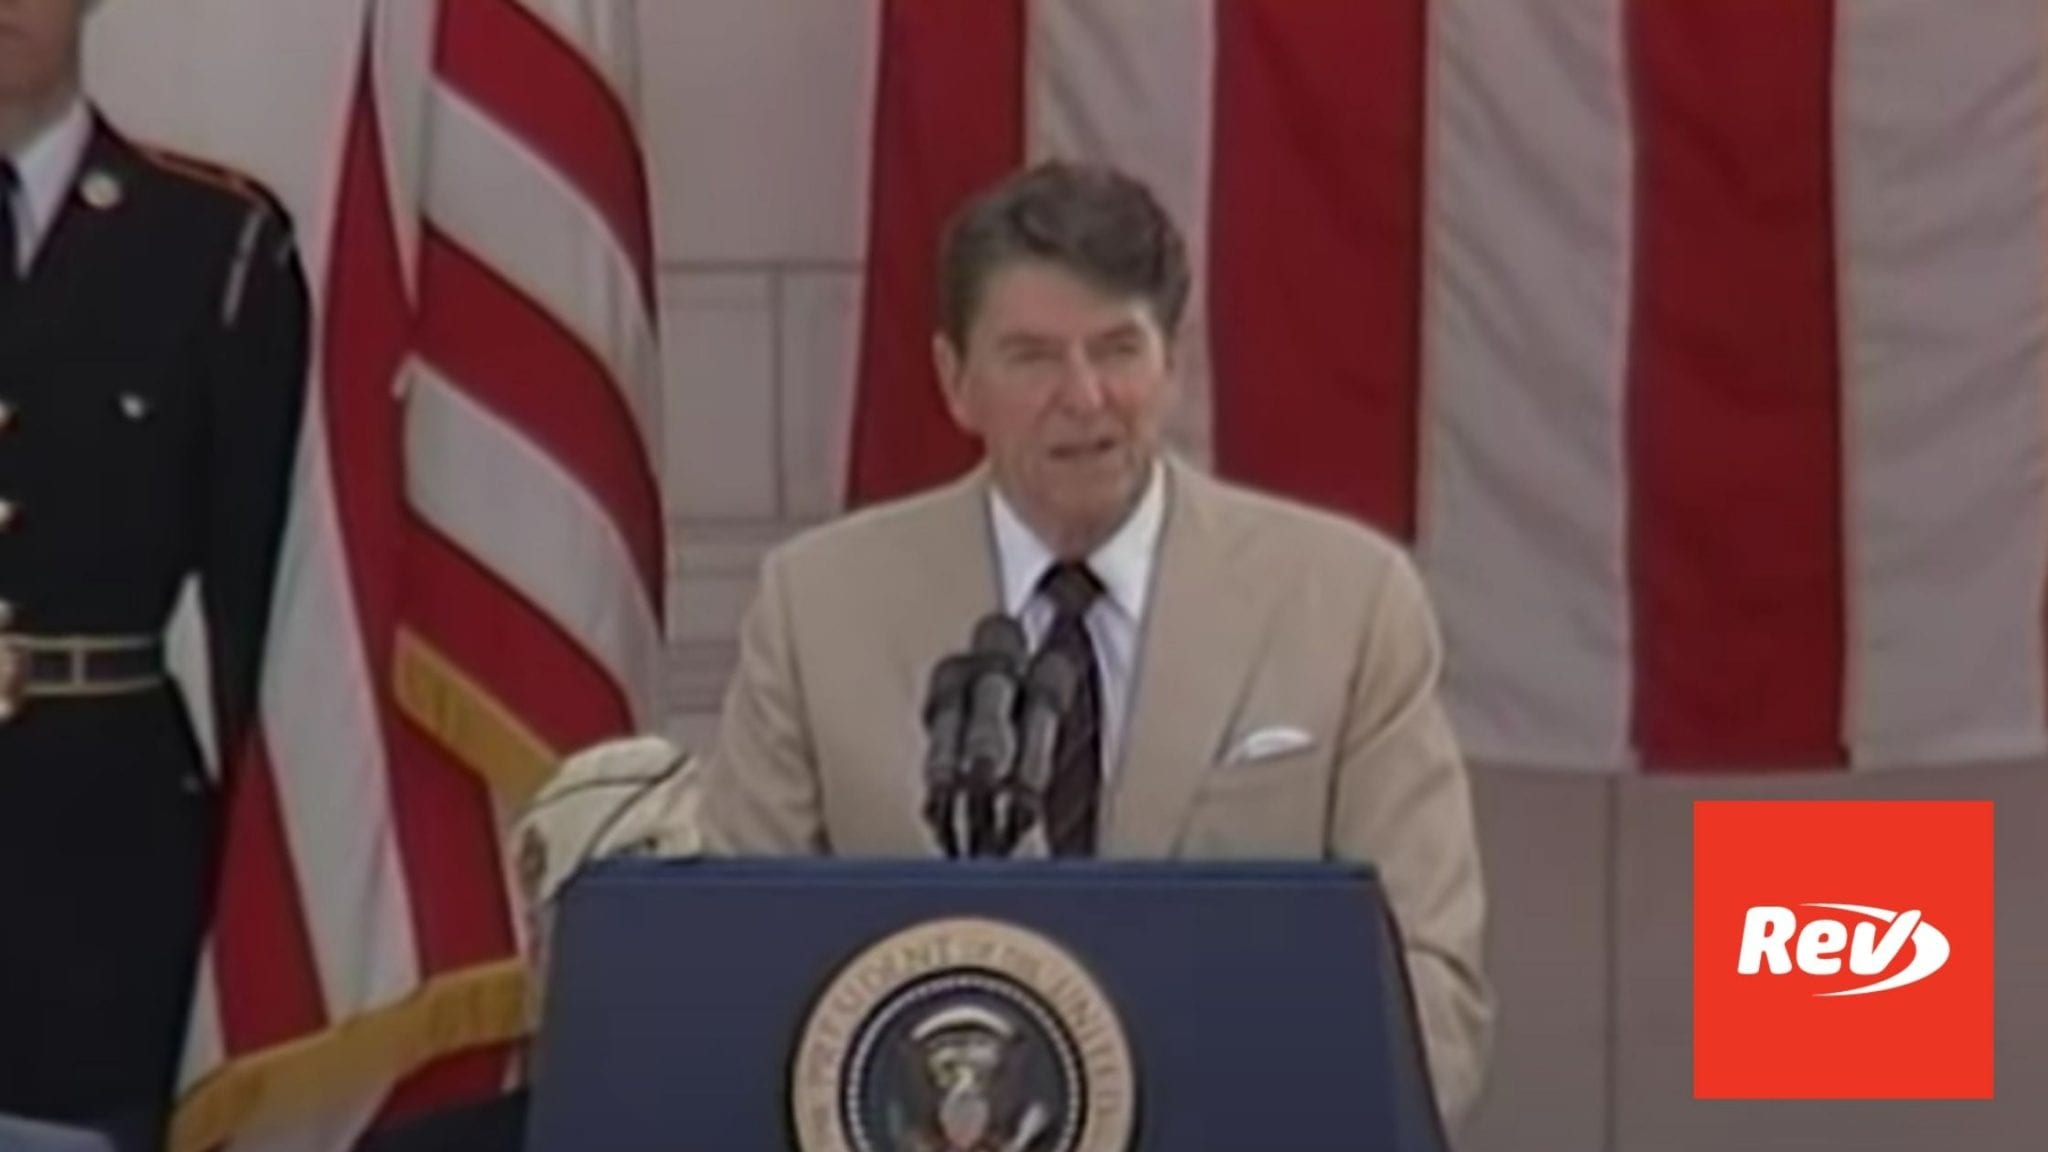 Ronald Reagan Memorial Day Speech Transcript 1982